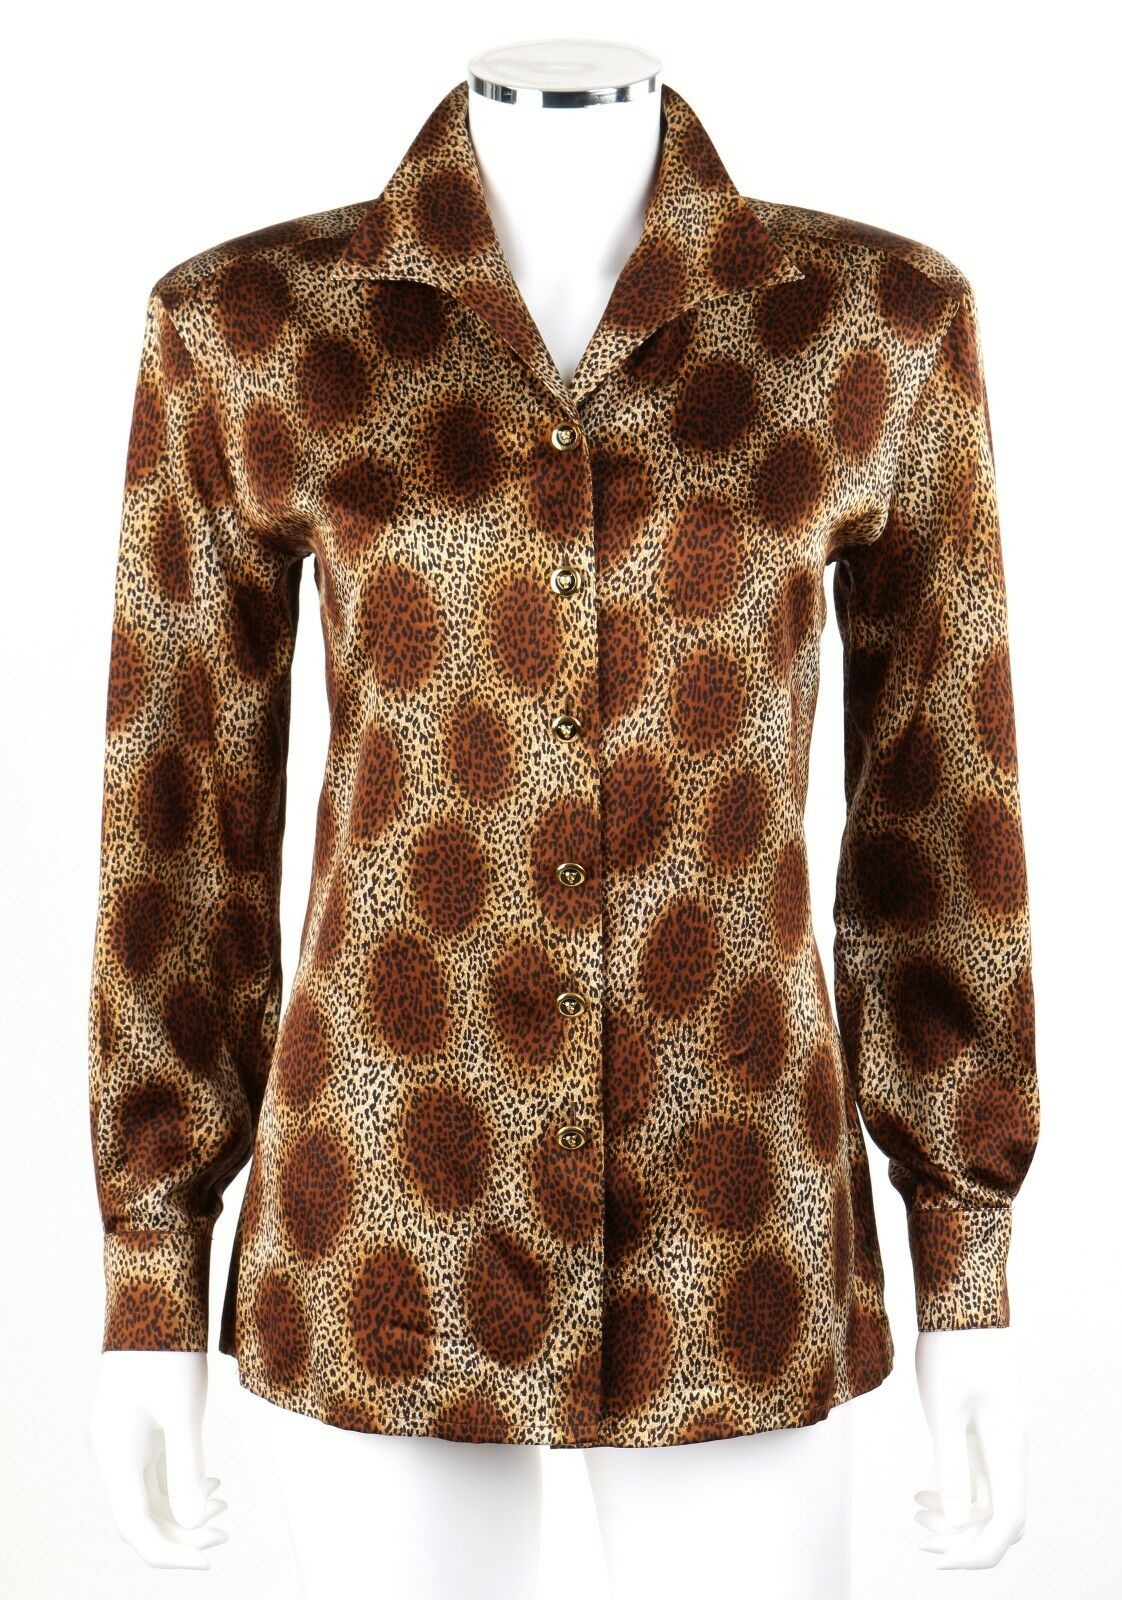 ESCADA Margaretha Ley braun Dot Animal Leopard Print Silk Shirt Blouse Größe 34